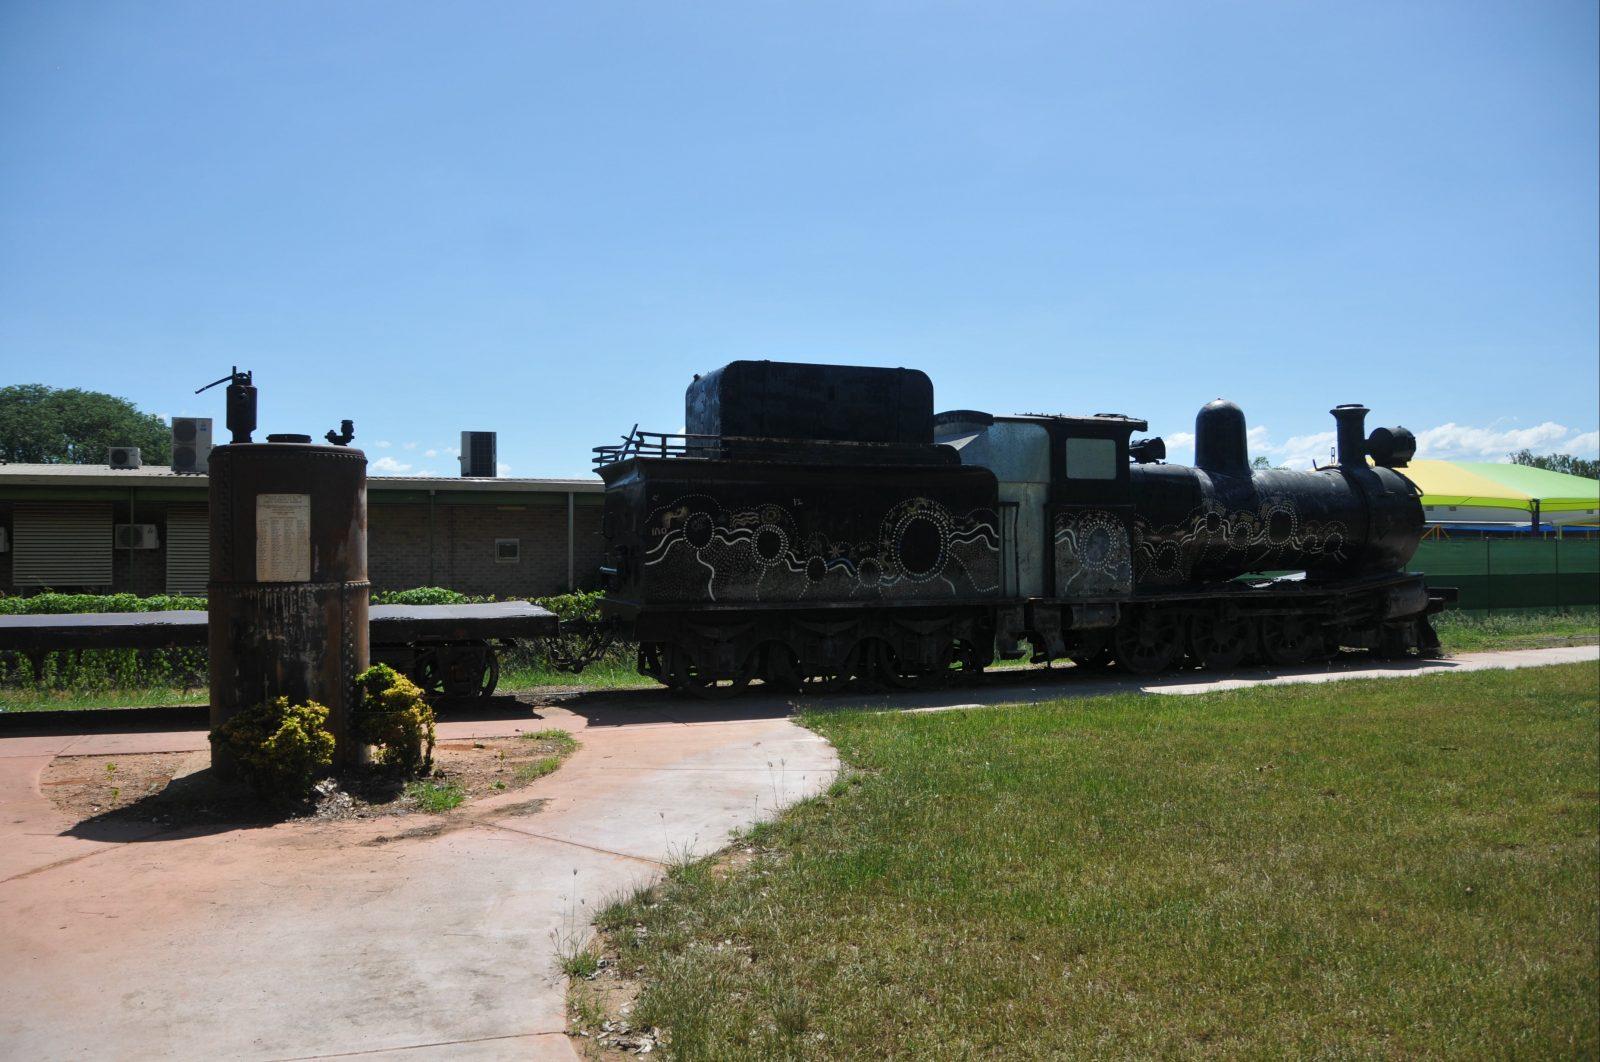 Steam traine & bioler with commemorative plaque